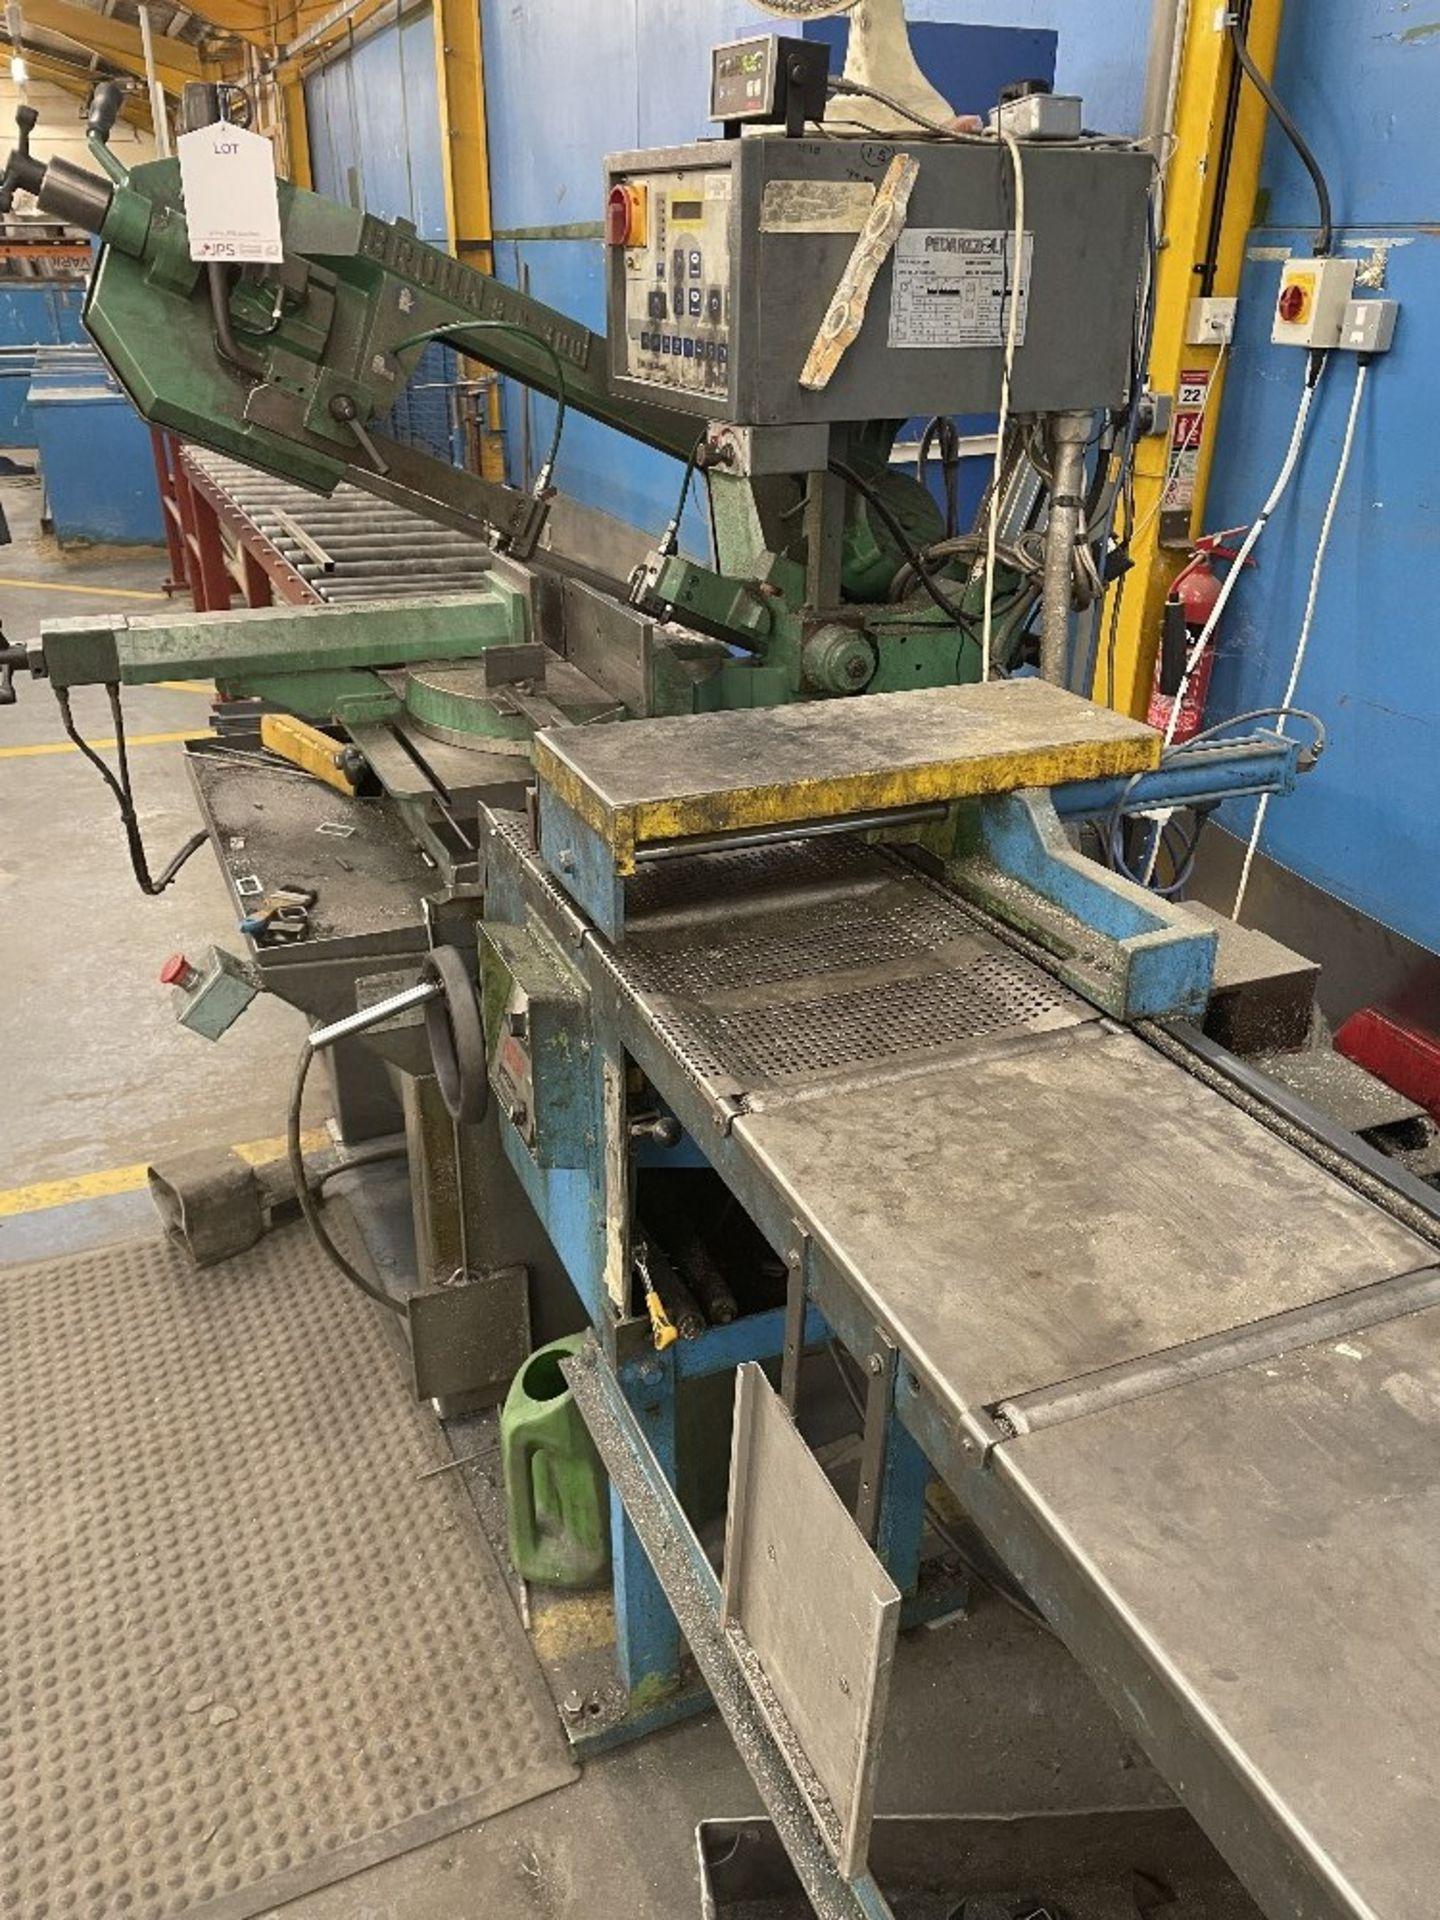 Pedrazzoli Brown SC 300 Horizontal Bandsaw w/ 4m Powered Conveyor - Image 11 of 12